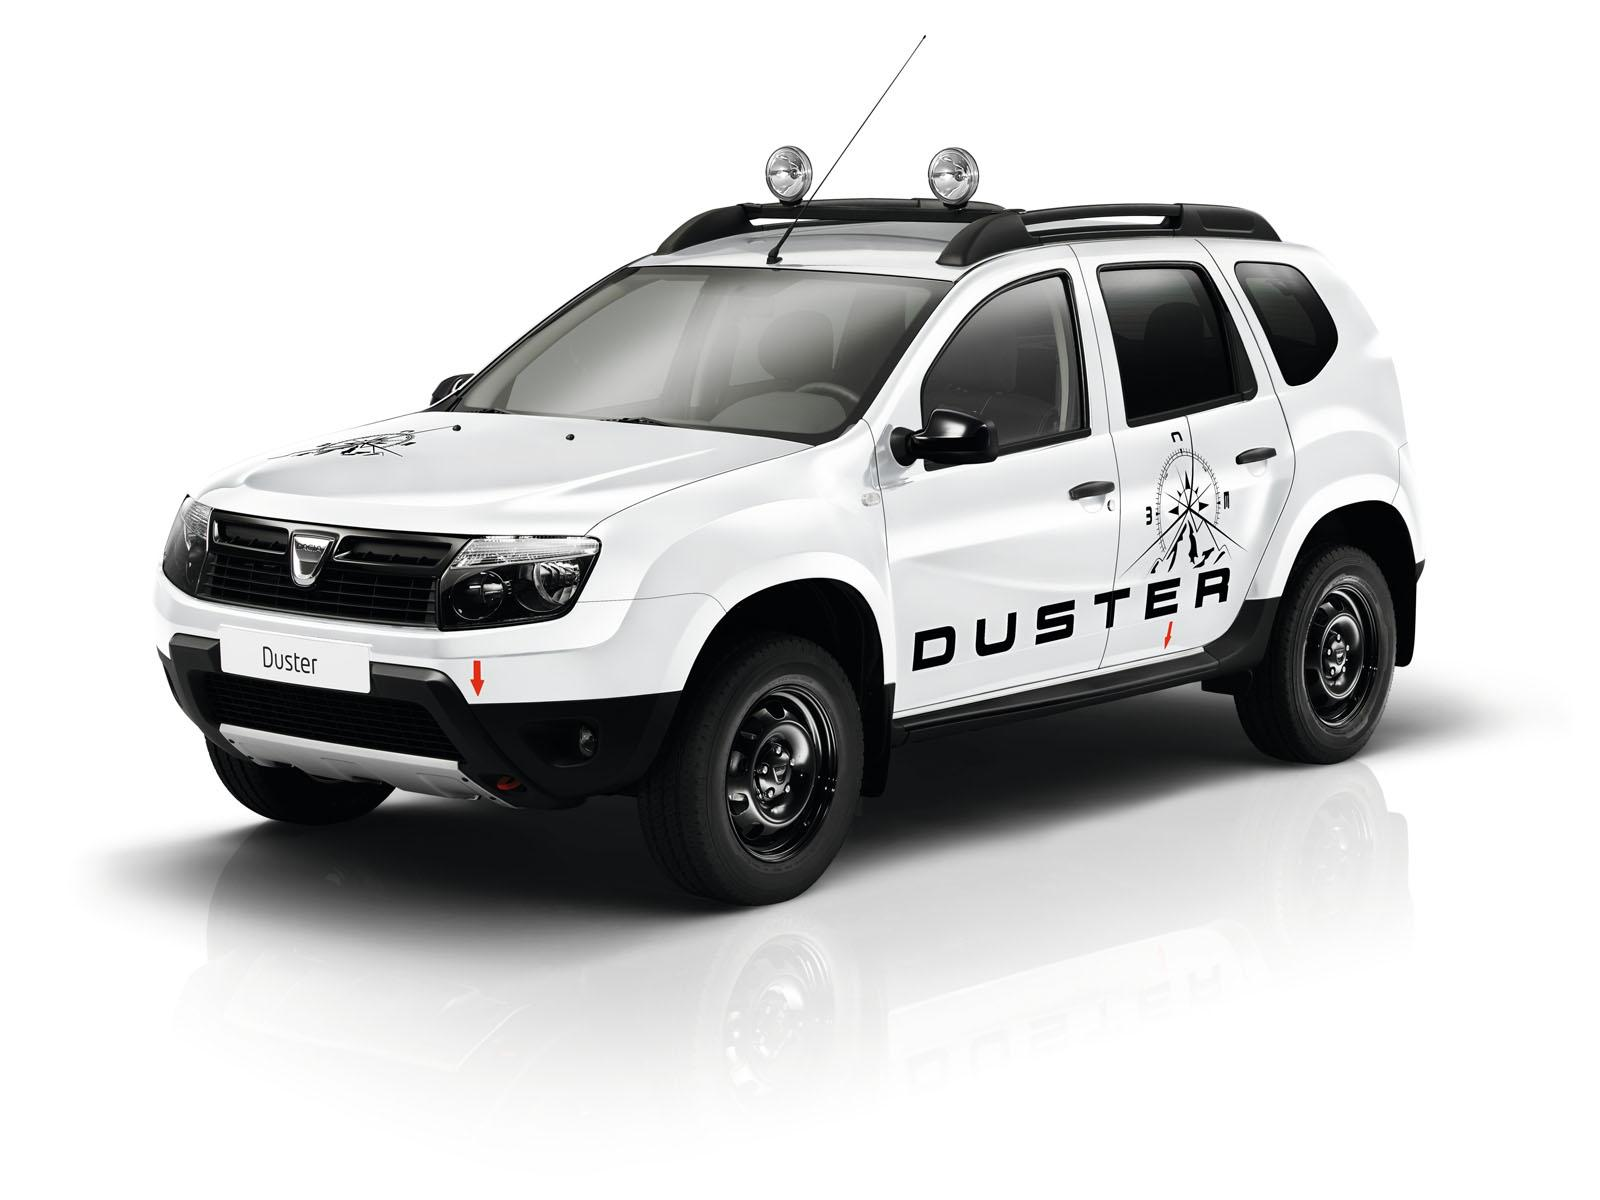 2013 Geneva Motor Show: Dacia Duster Adventure Edition  - фотография №3